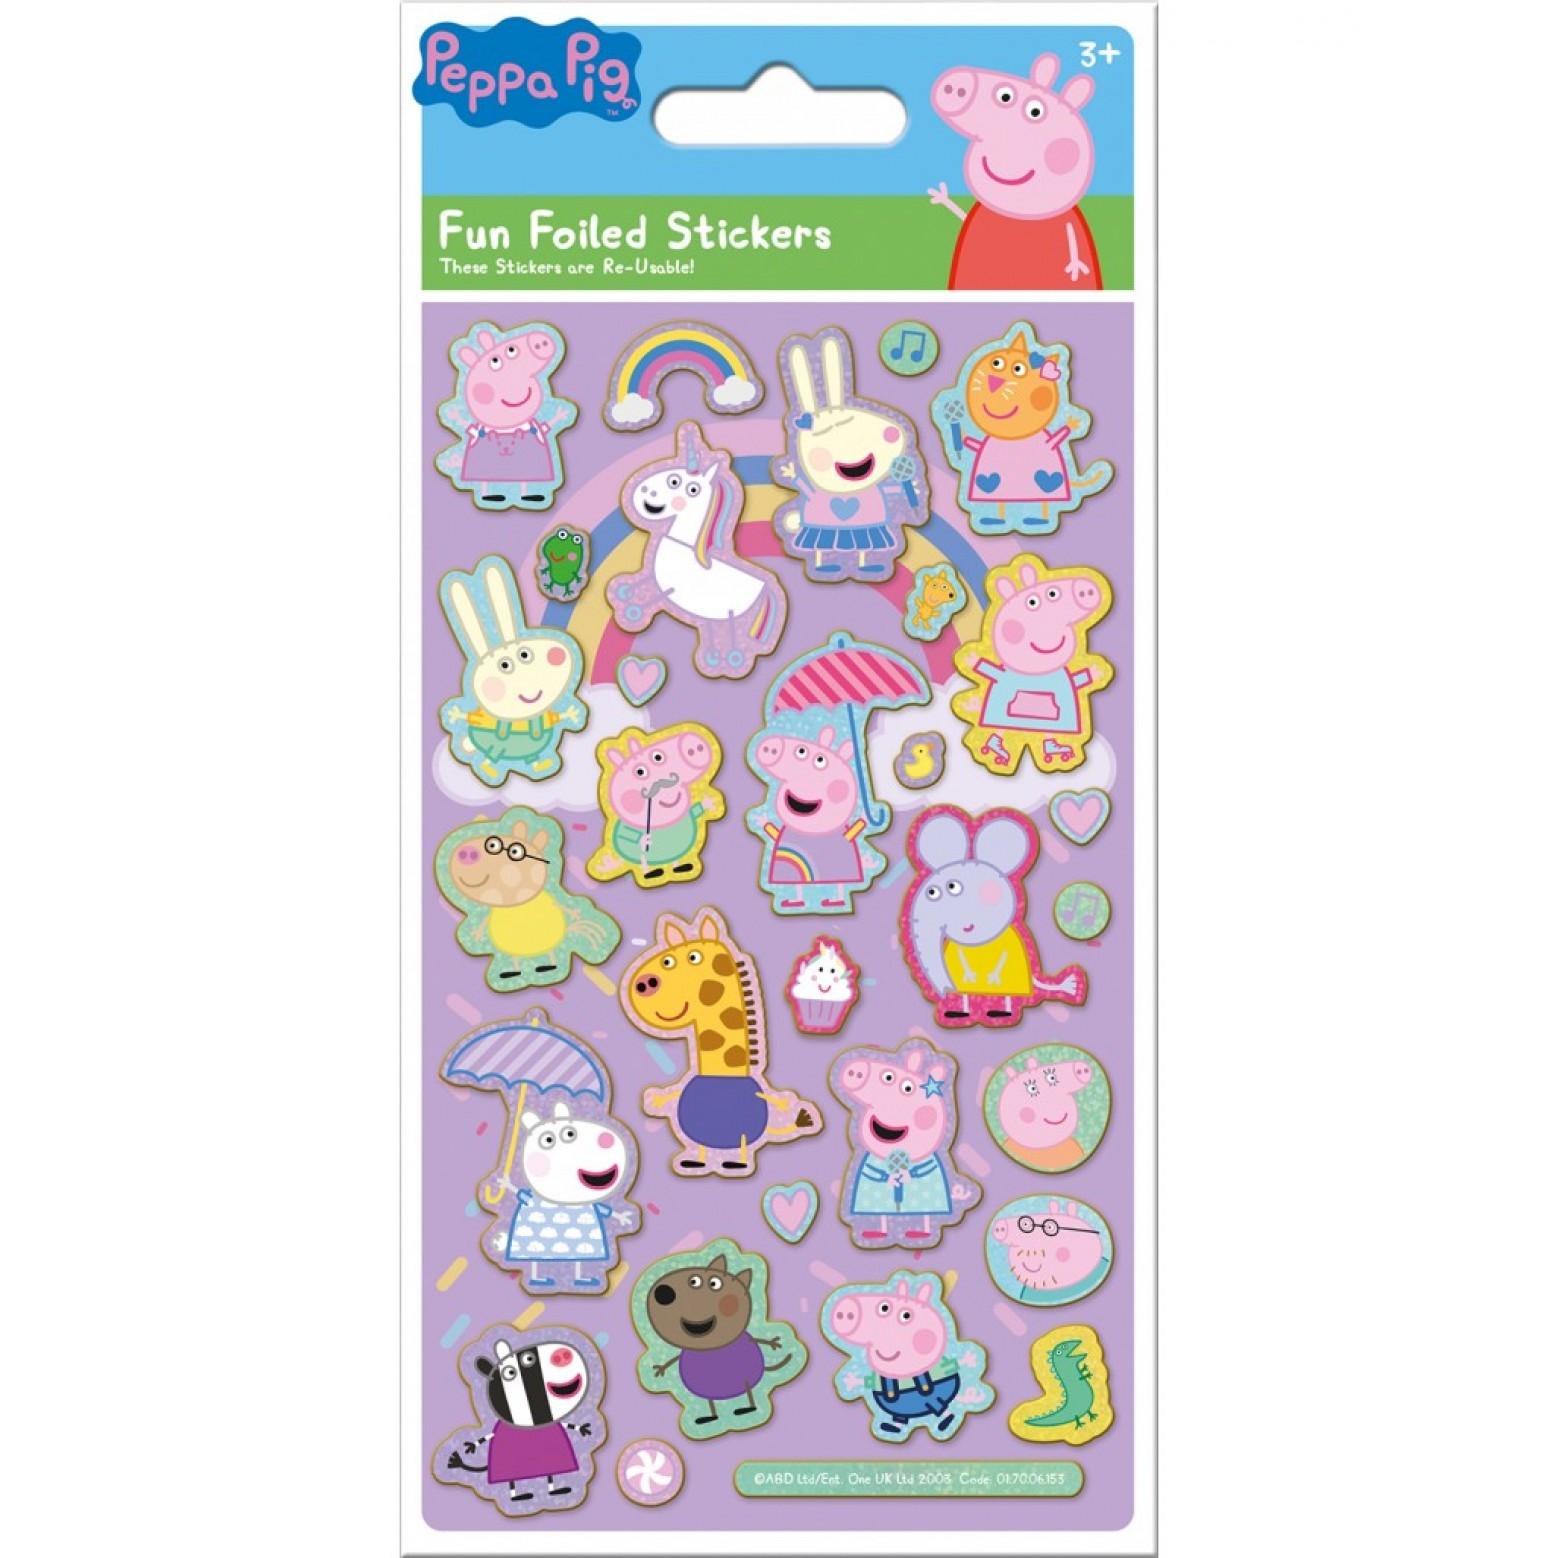 Peppa Pig herbruikbare stickers 3+